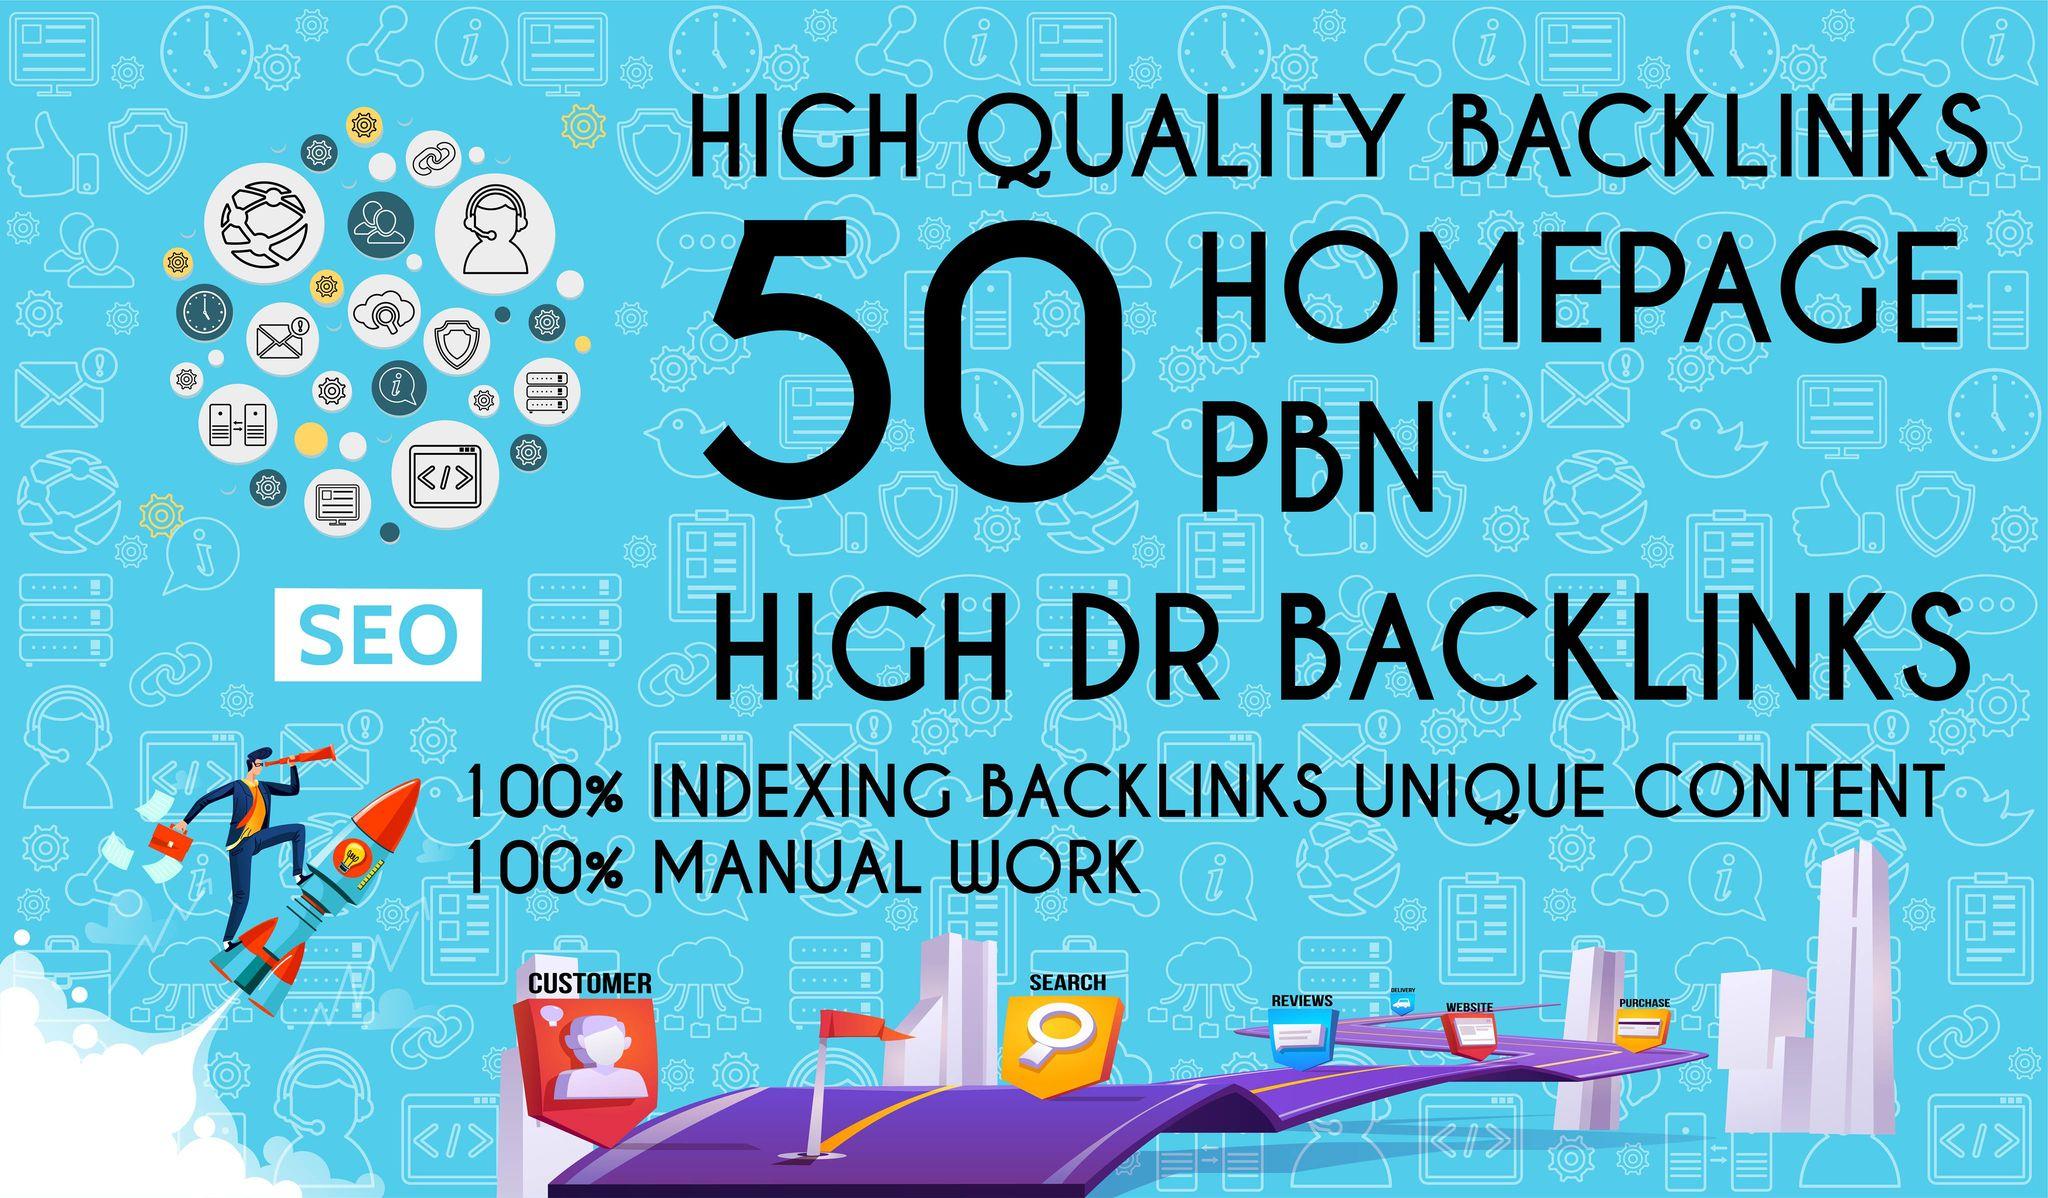 Get 50 Dofollow Homepage PBN Backlinks On High DA & DR